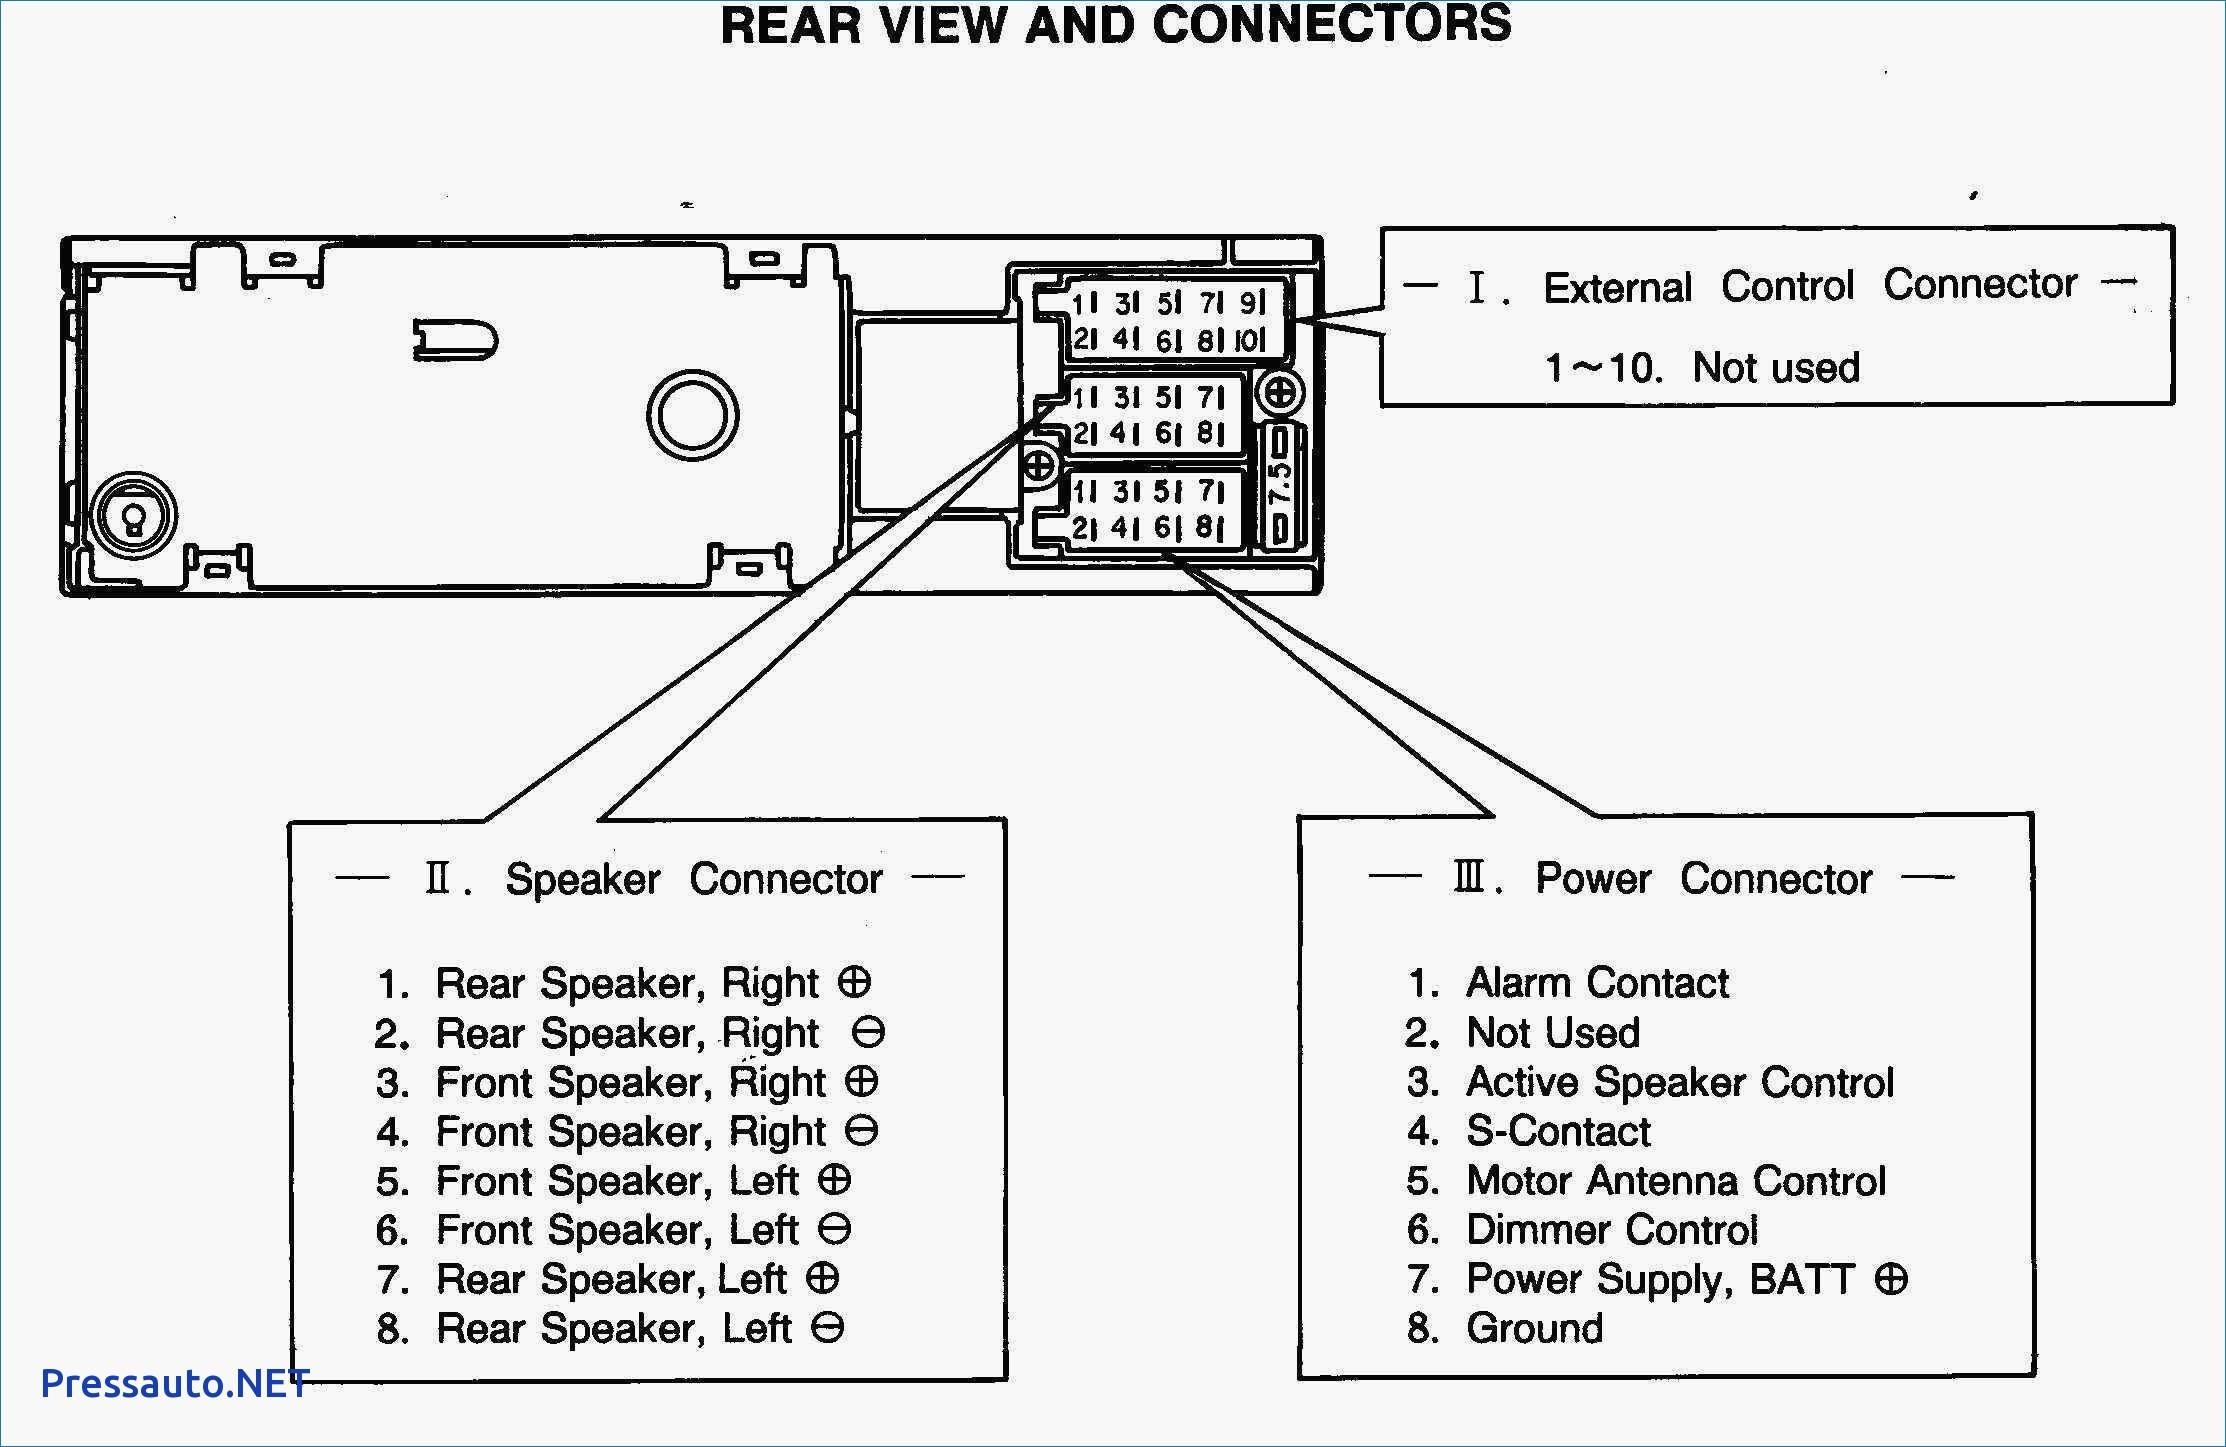 Kenwood wiring diagram elegant wiring diagram image wiring diagram kenwood car radio wiring diagram jeep grand cherokee wj pioneer fh x700bt harness 1997 asfbconference2016 Gallery